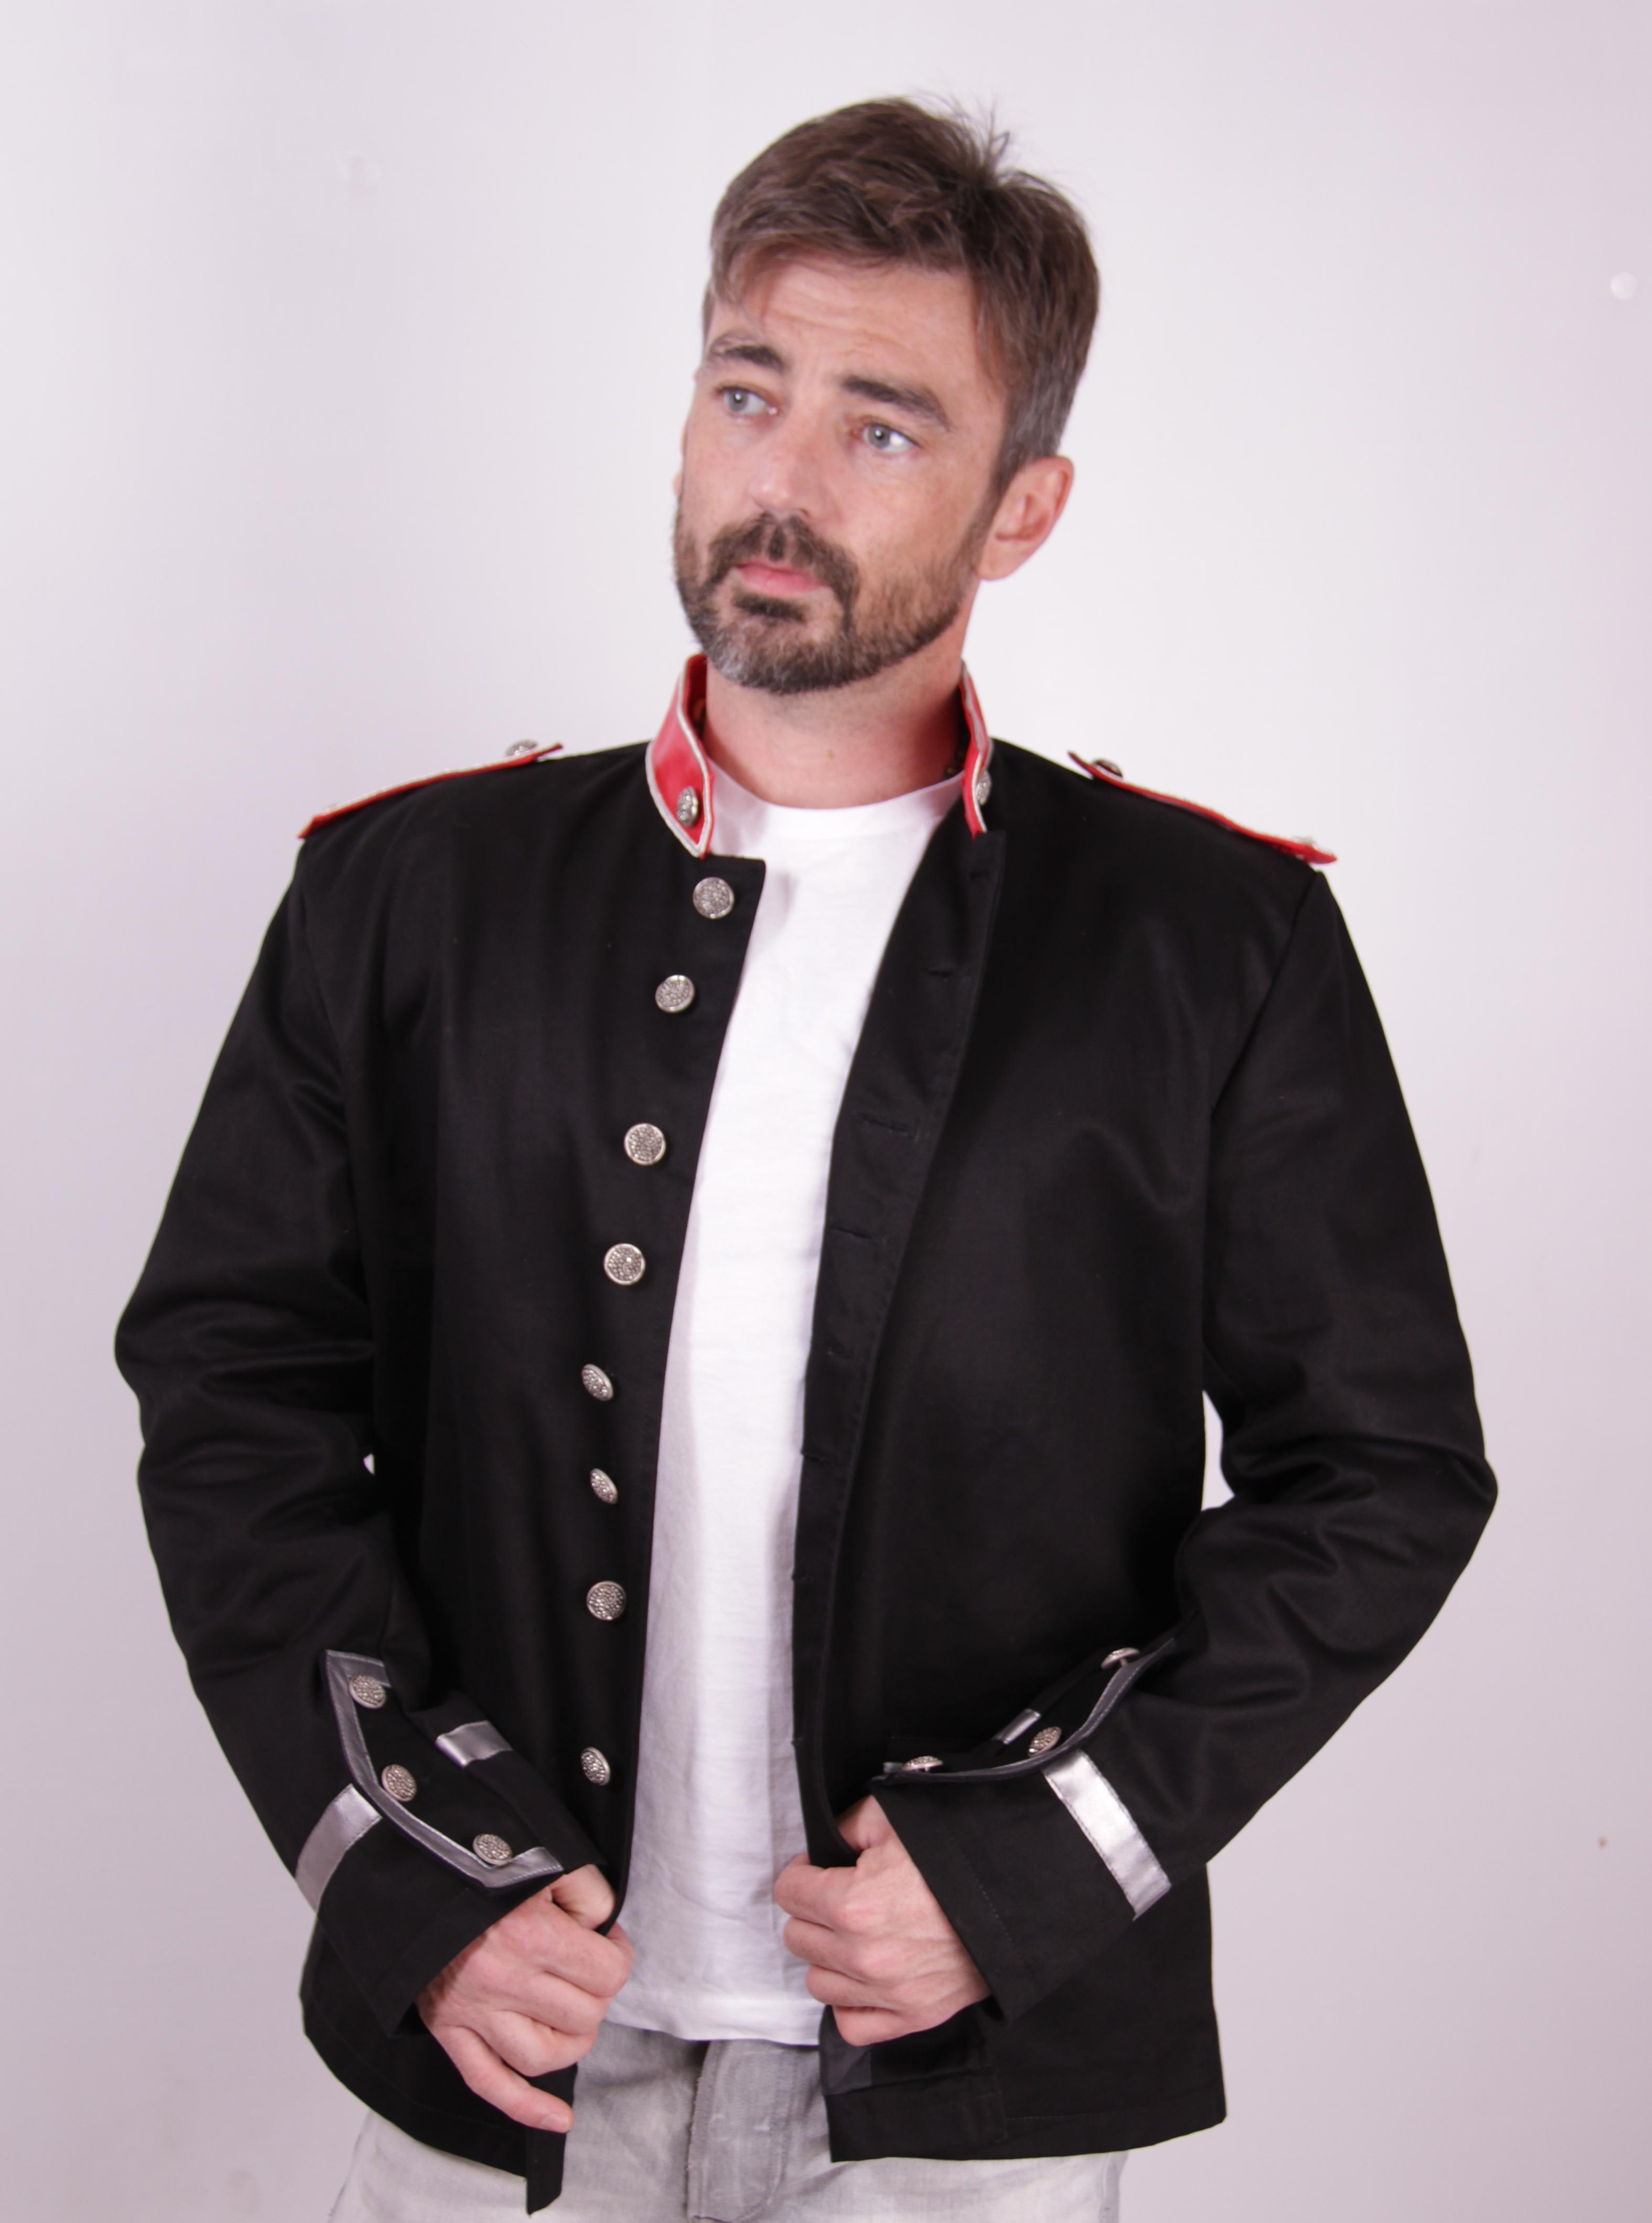 malik_guardsman_style_jacket_lady_ks_black_jackets_and_outerwear_5.JPG